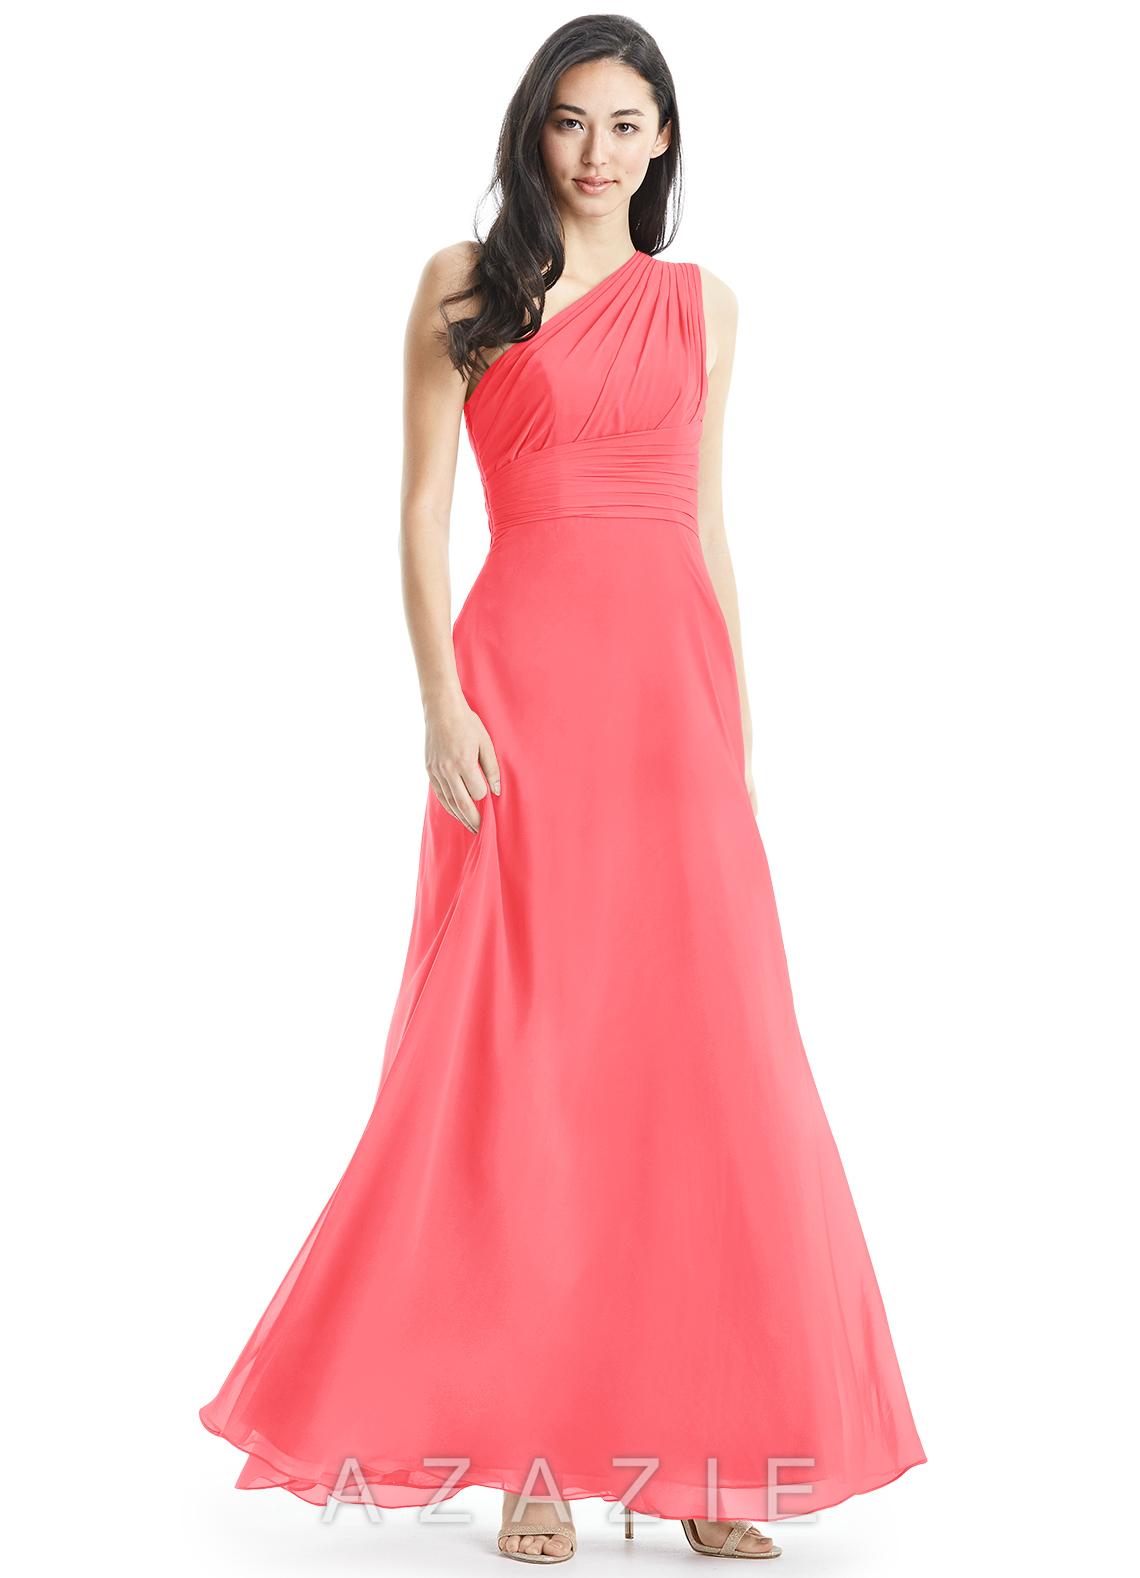 Azazie ashley bridesmaid dress azazie color watermelon ombrellifo Image collections